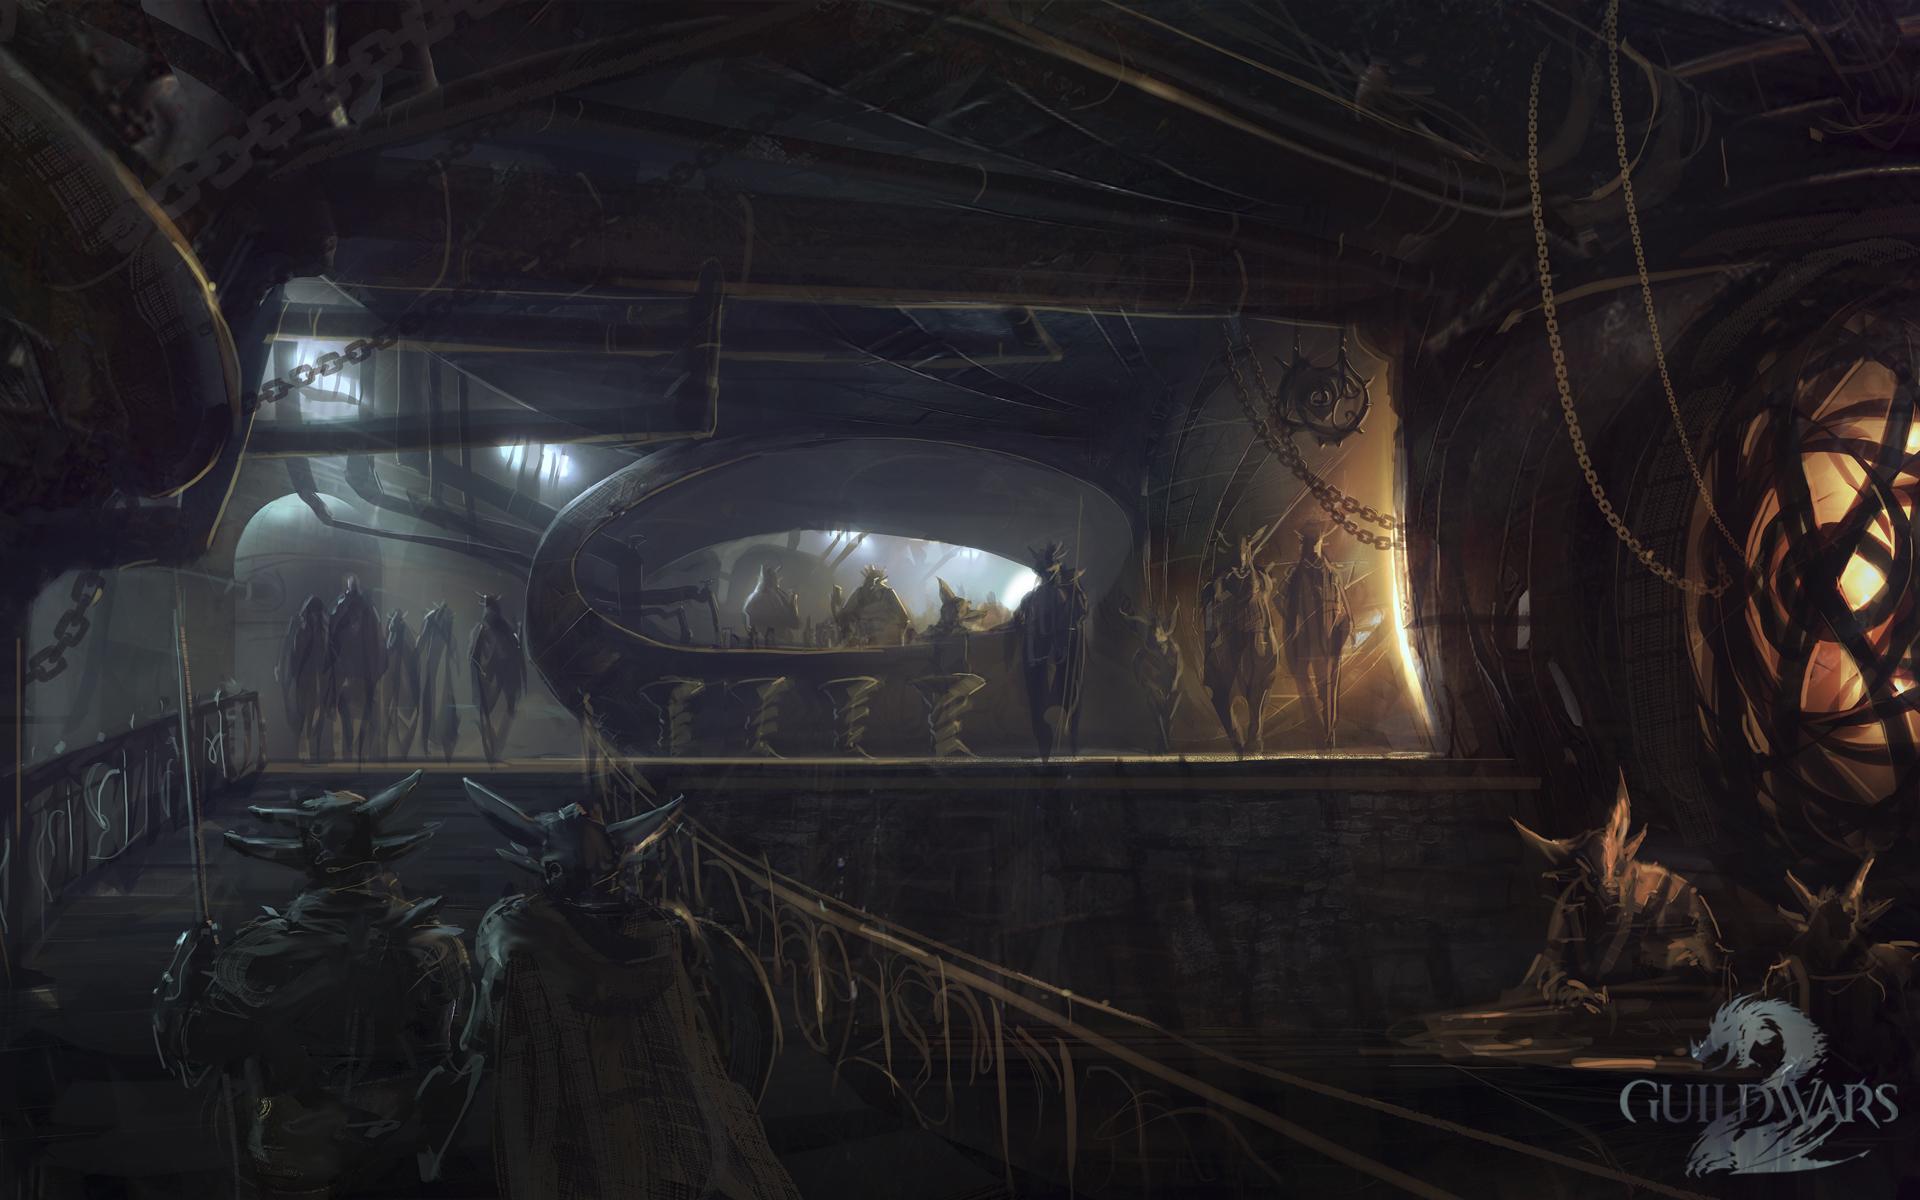 Guild Wars 2 wallpaper 21